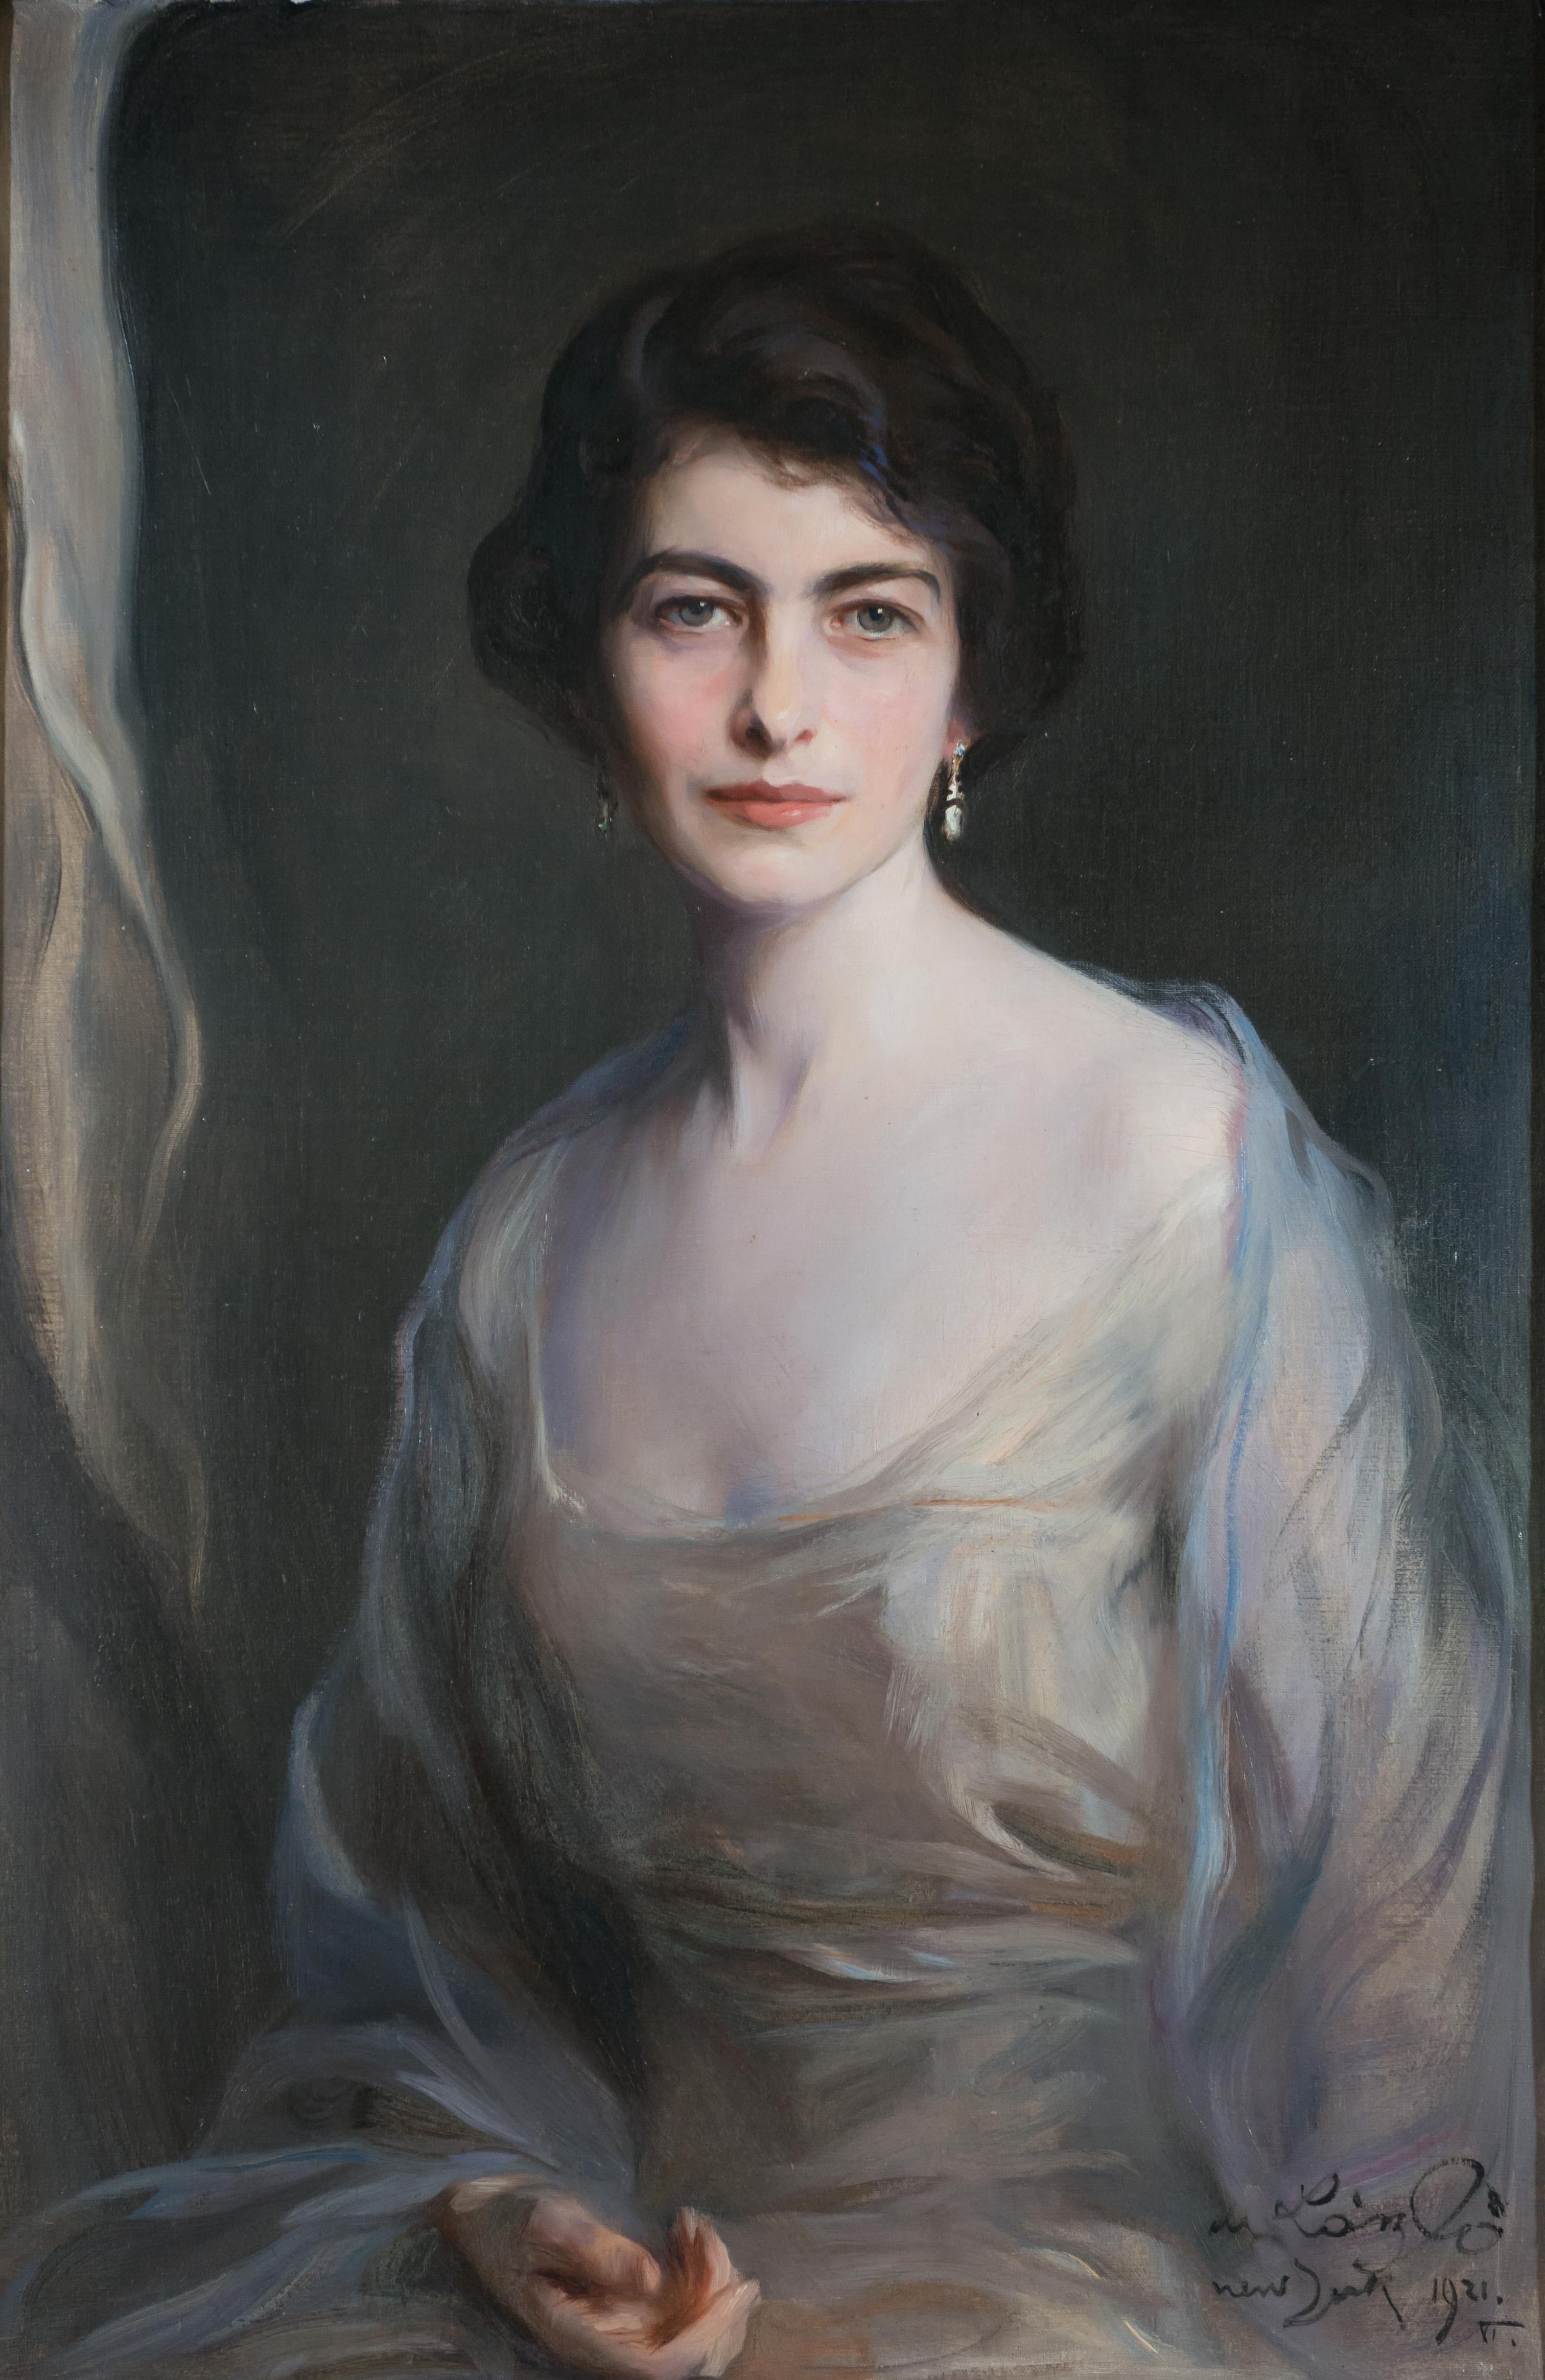 https://upload.wikimedia.org/wikipedia/commons/2/2d/Portrait_of_Countess_Laszlo_Szechenyi.jpg